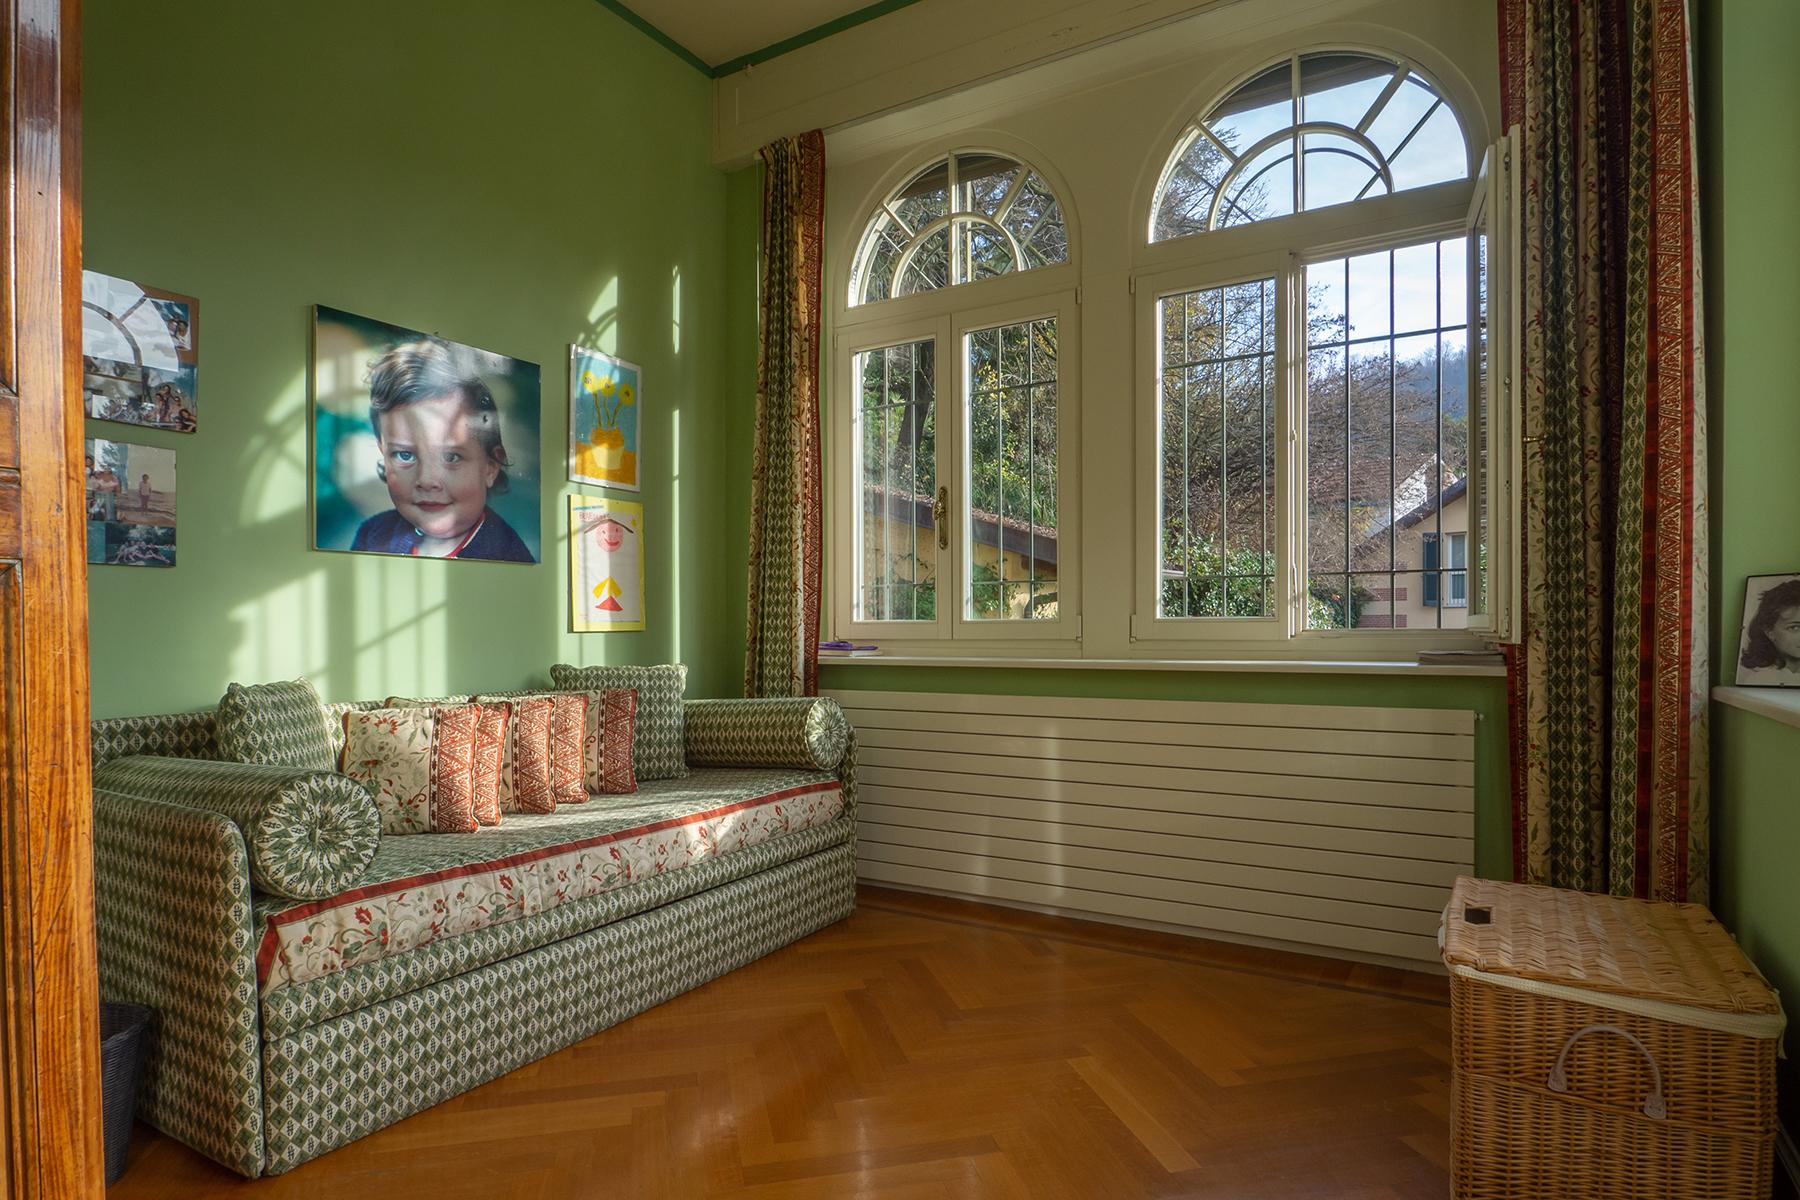 Casa indipendente in Vendita a Torino: 5 locali, 657 mq - Foto 16